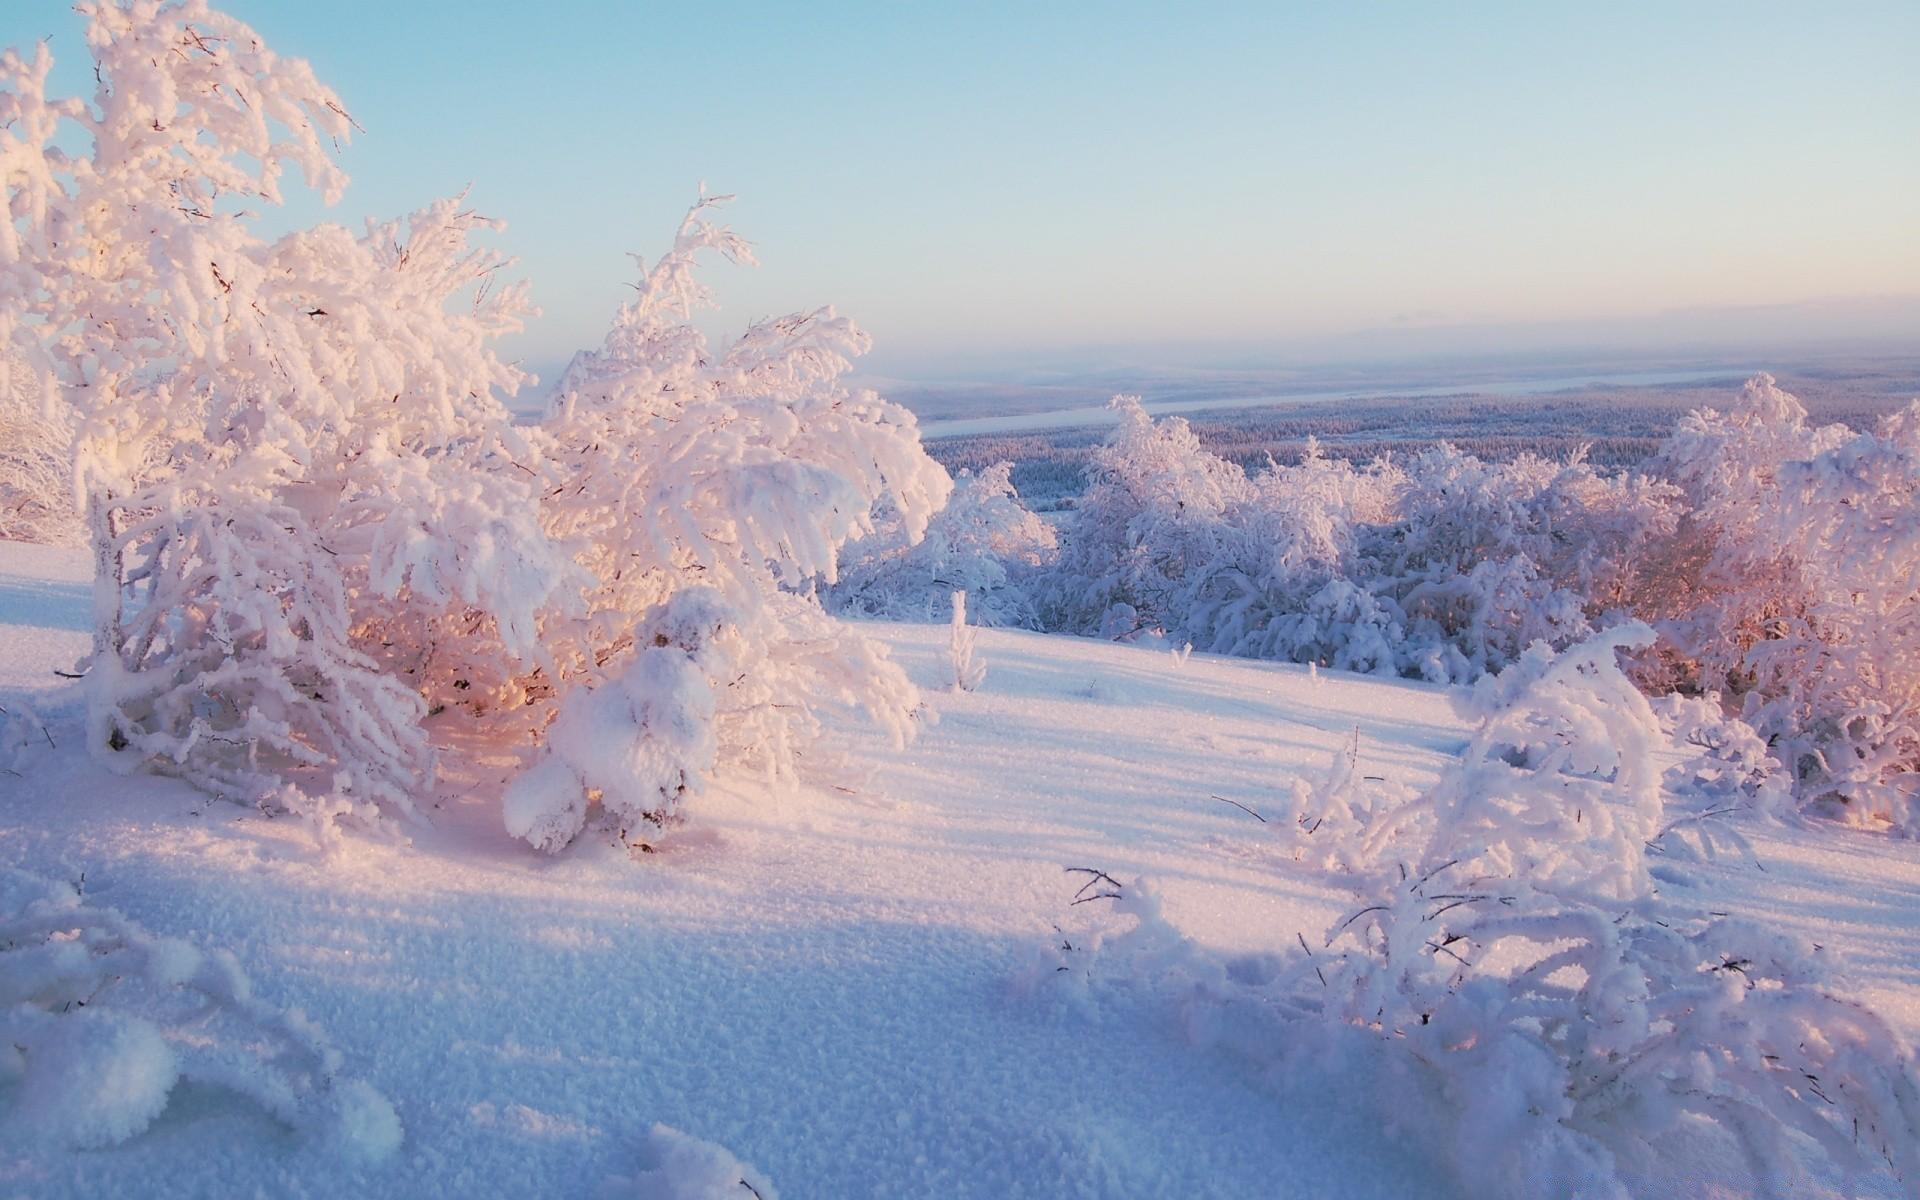 Картинки на экспресс панель зима